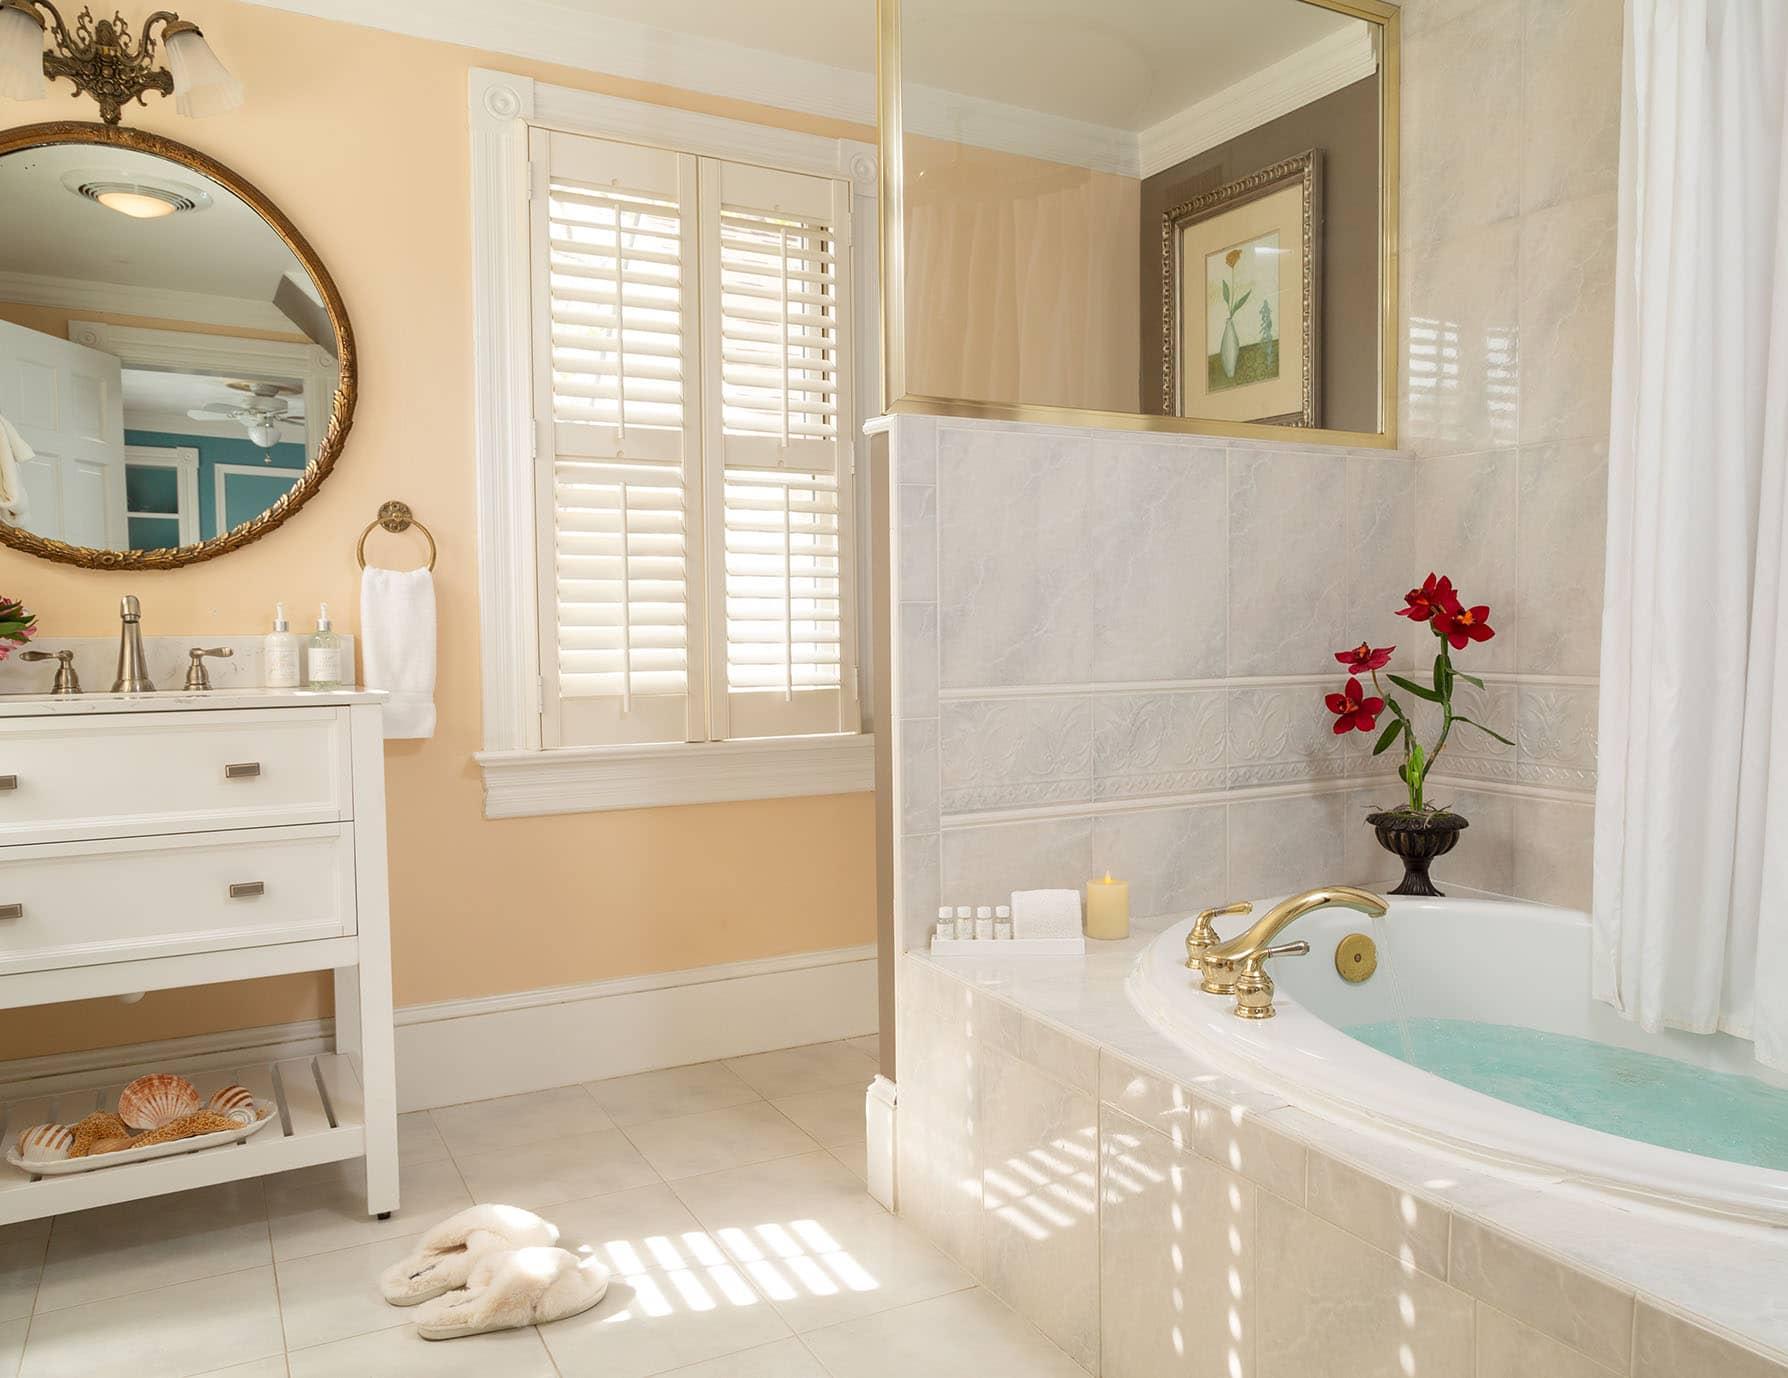 Roanoke Island Inn Luxurious Jetted Tub